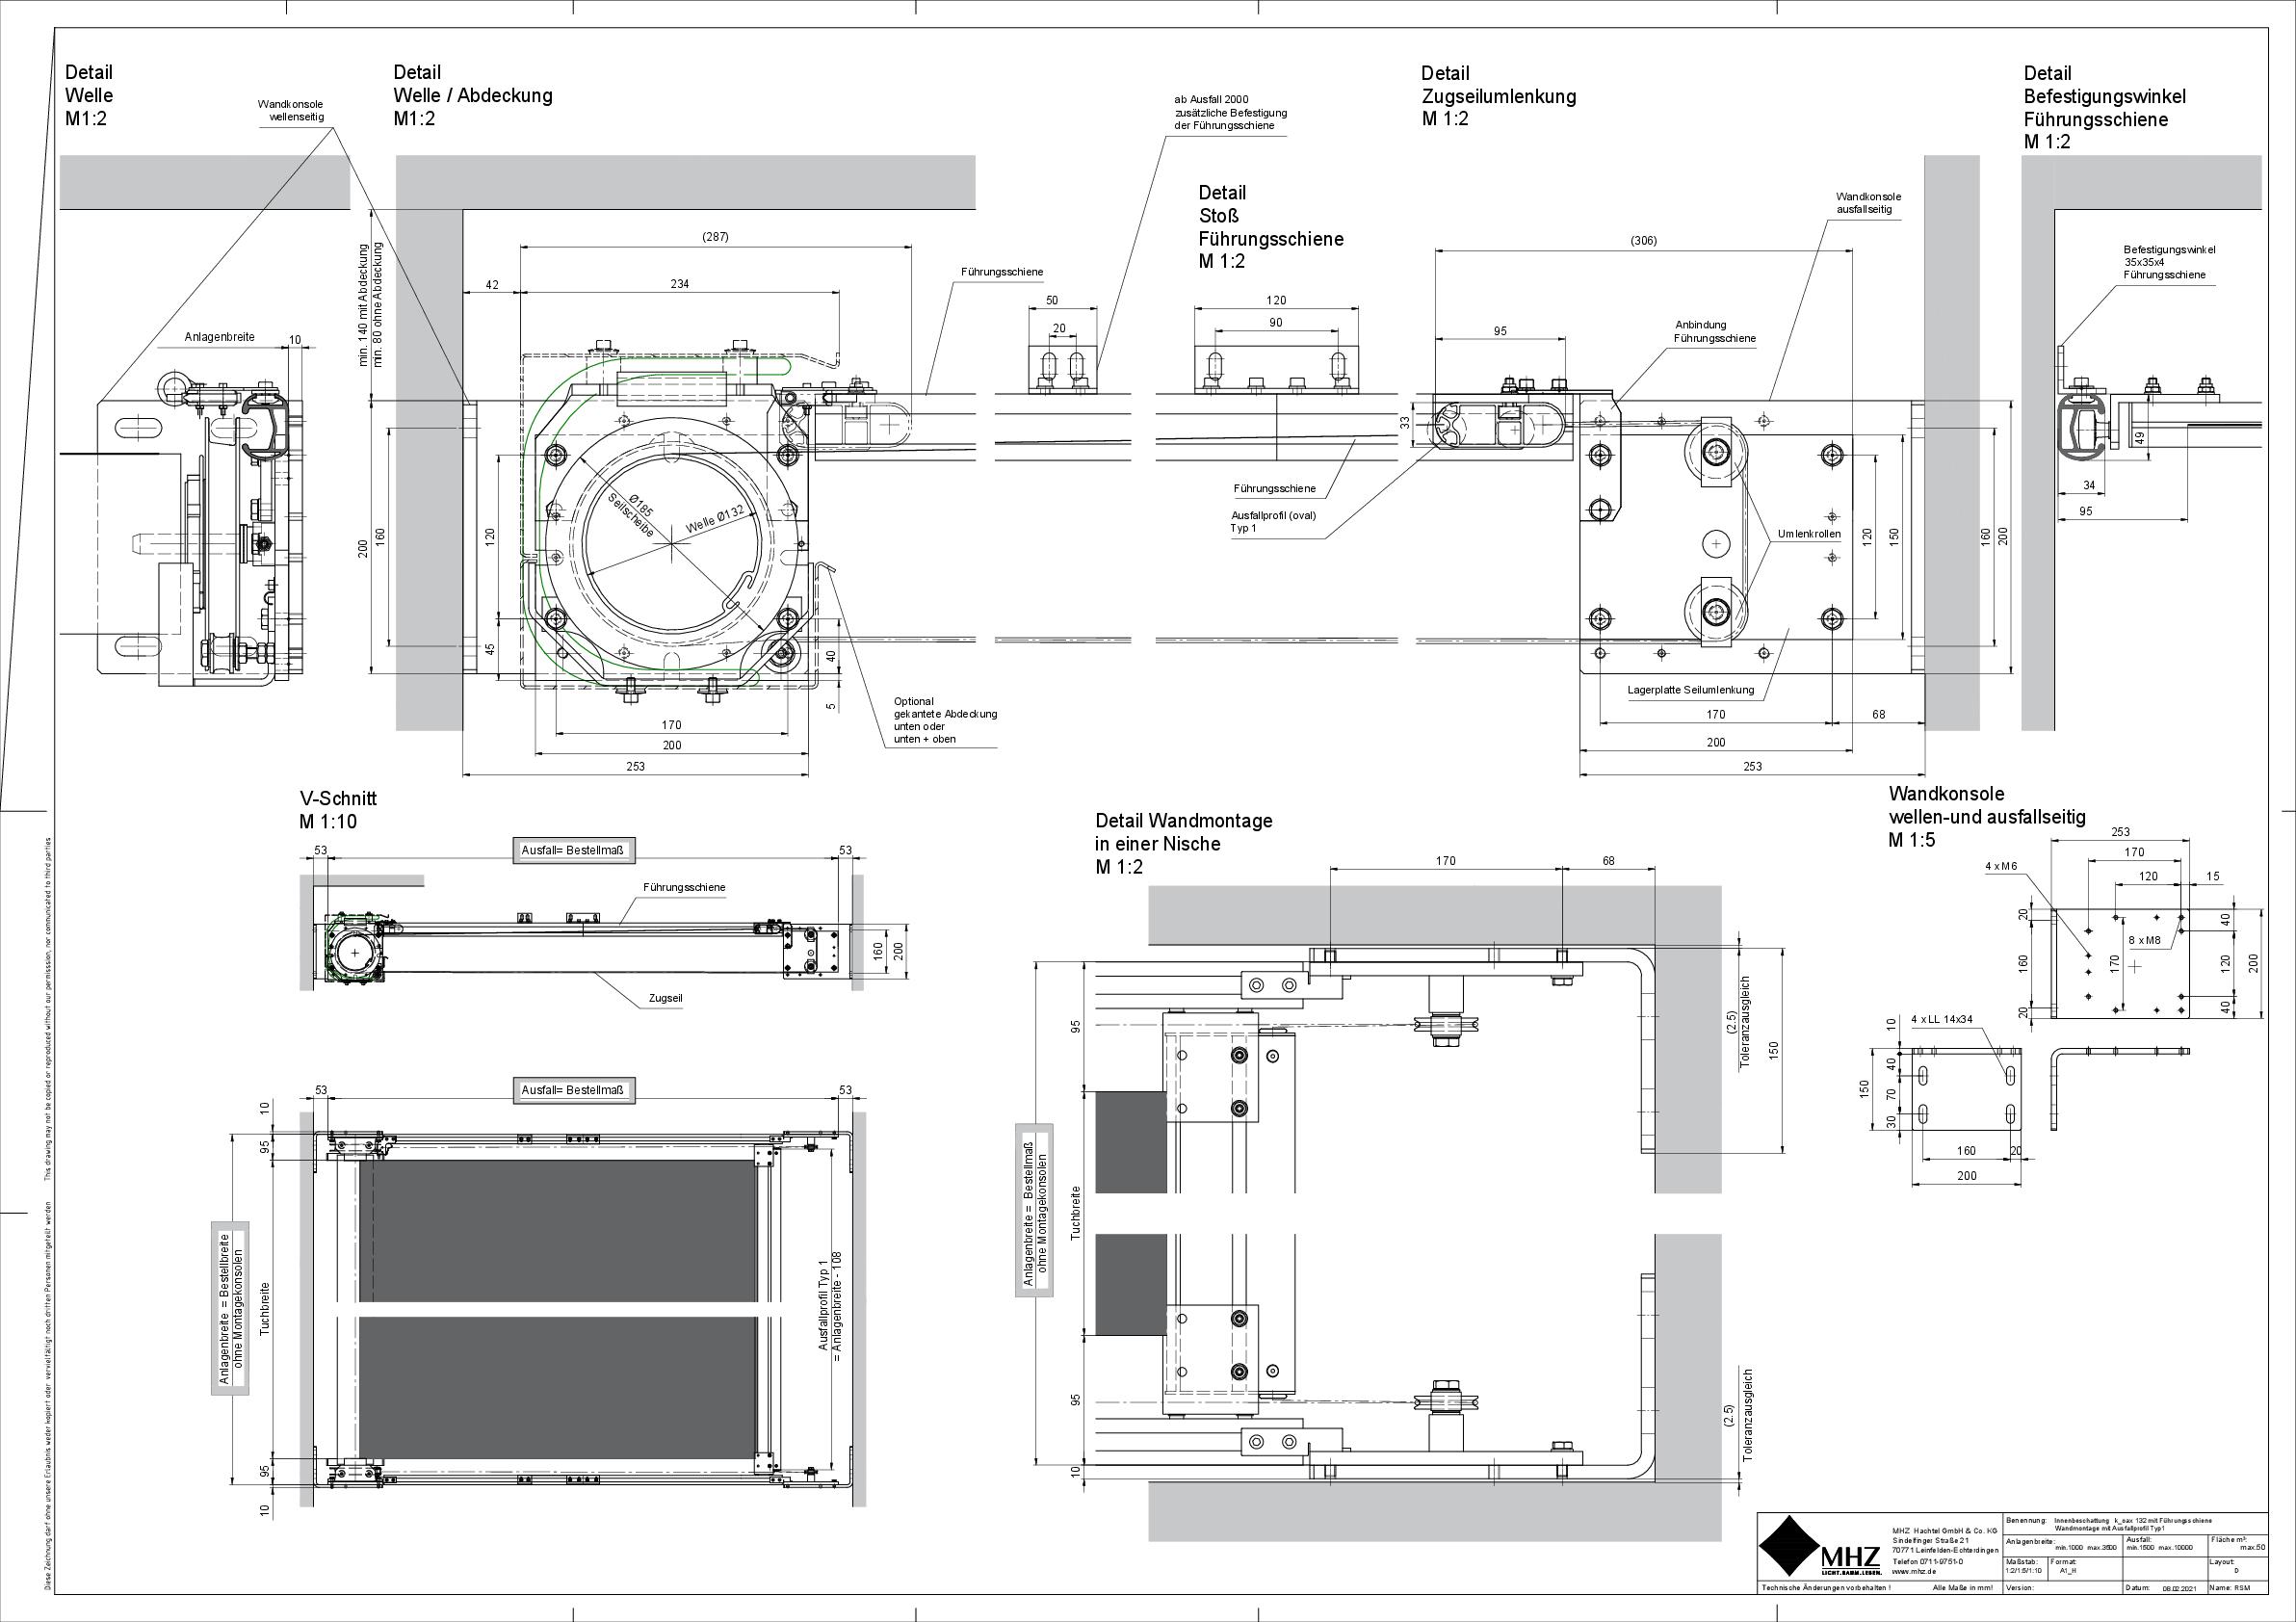 Technische Zeichnung pdf Beschattung k_oax 132